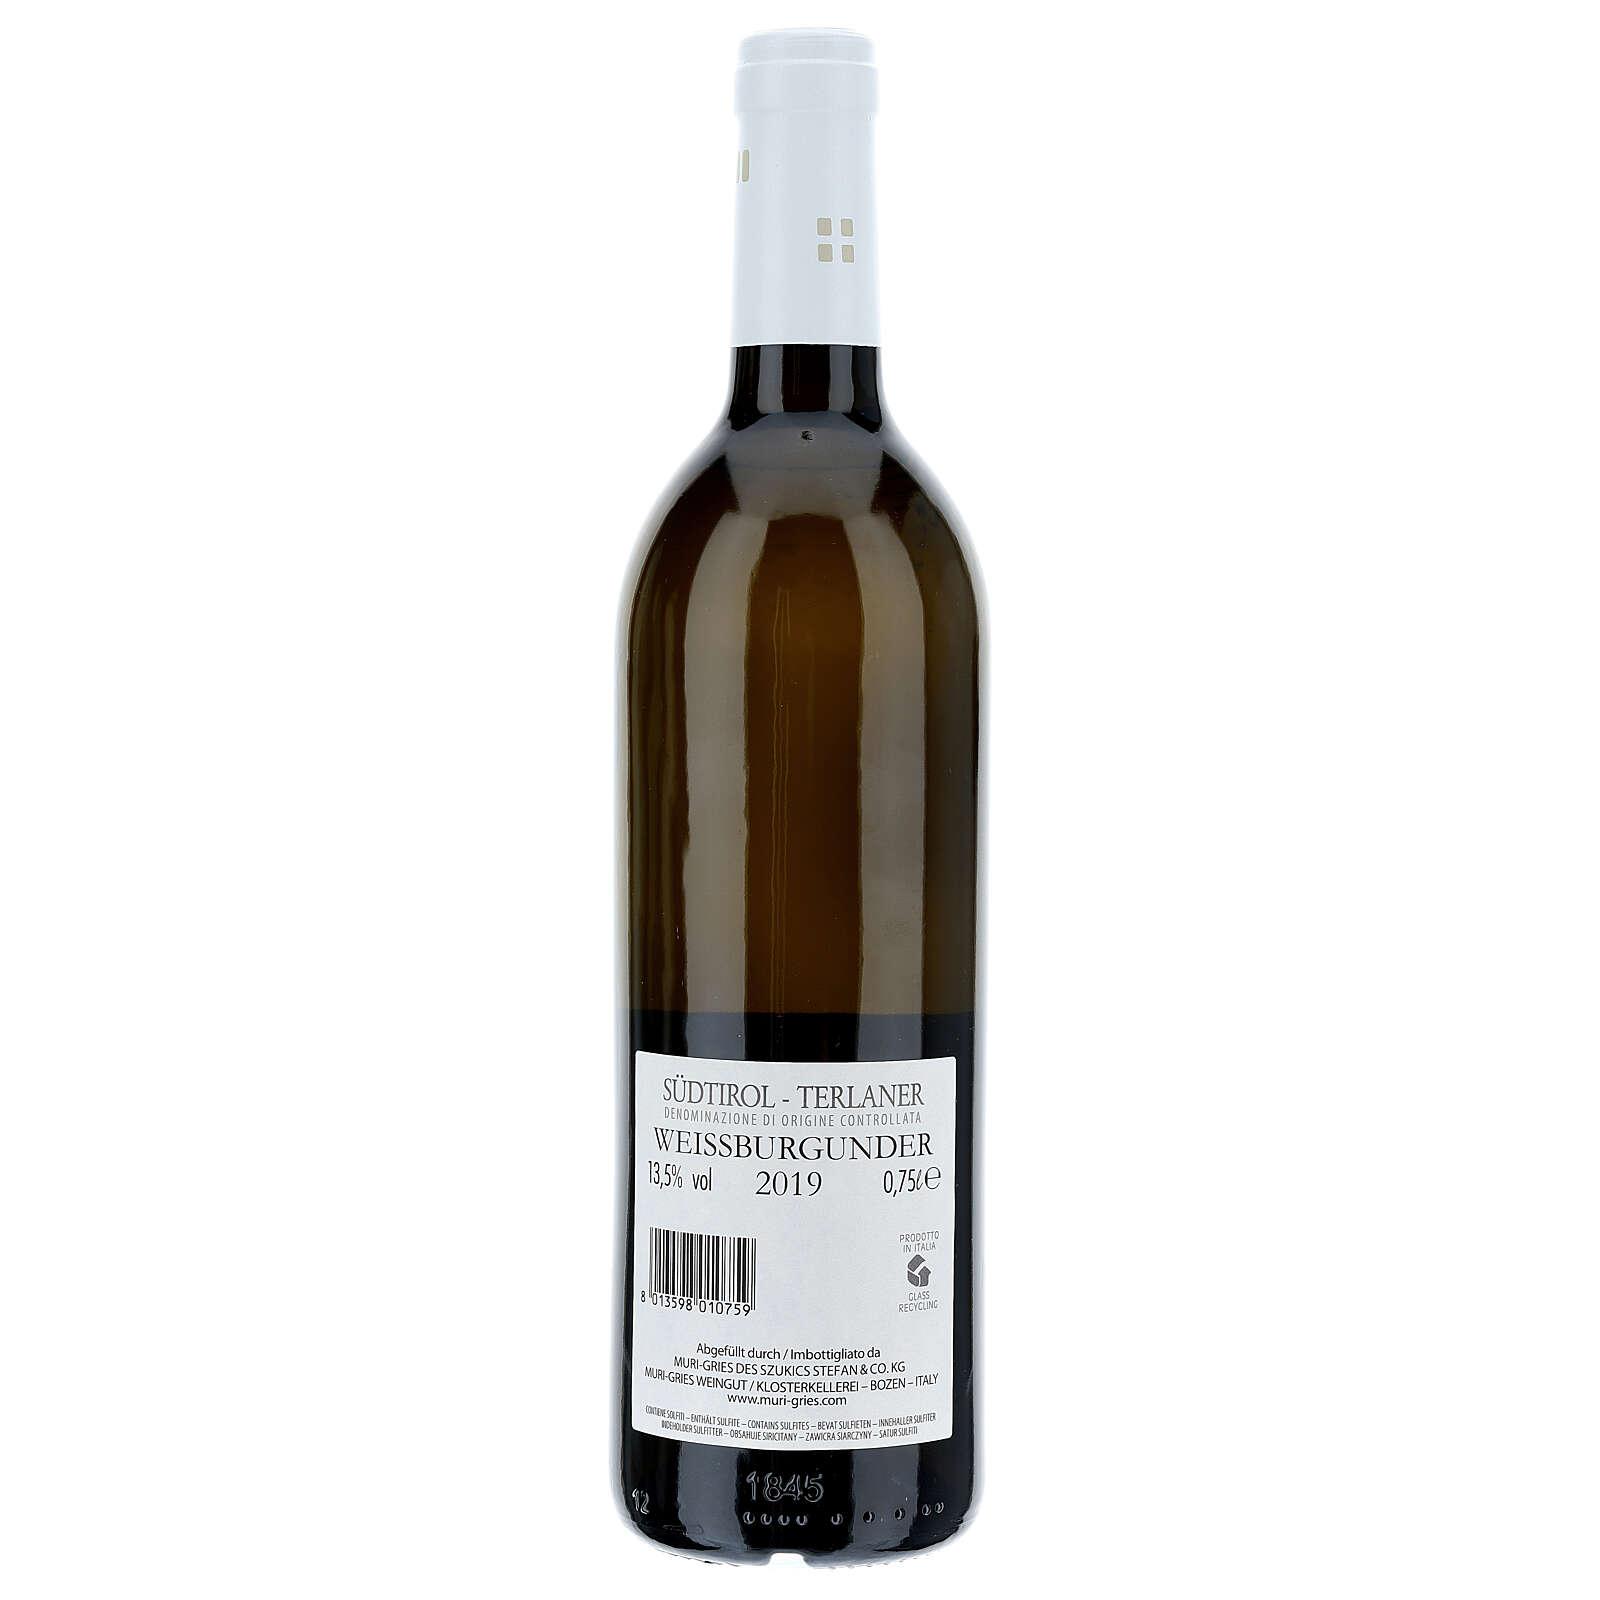 Vinho Pinot Branco de Terlano DOC 2019 Abadia Muri Gries 750 ml 3